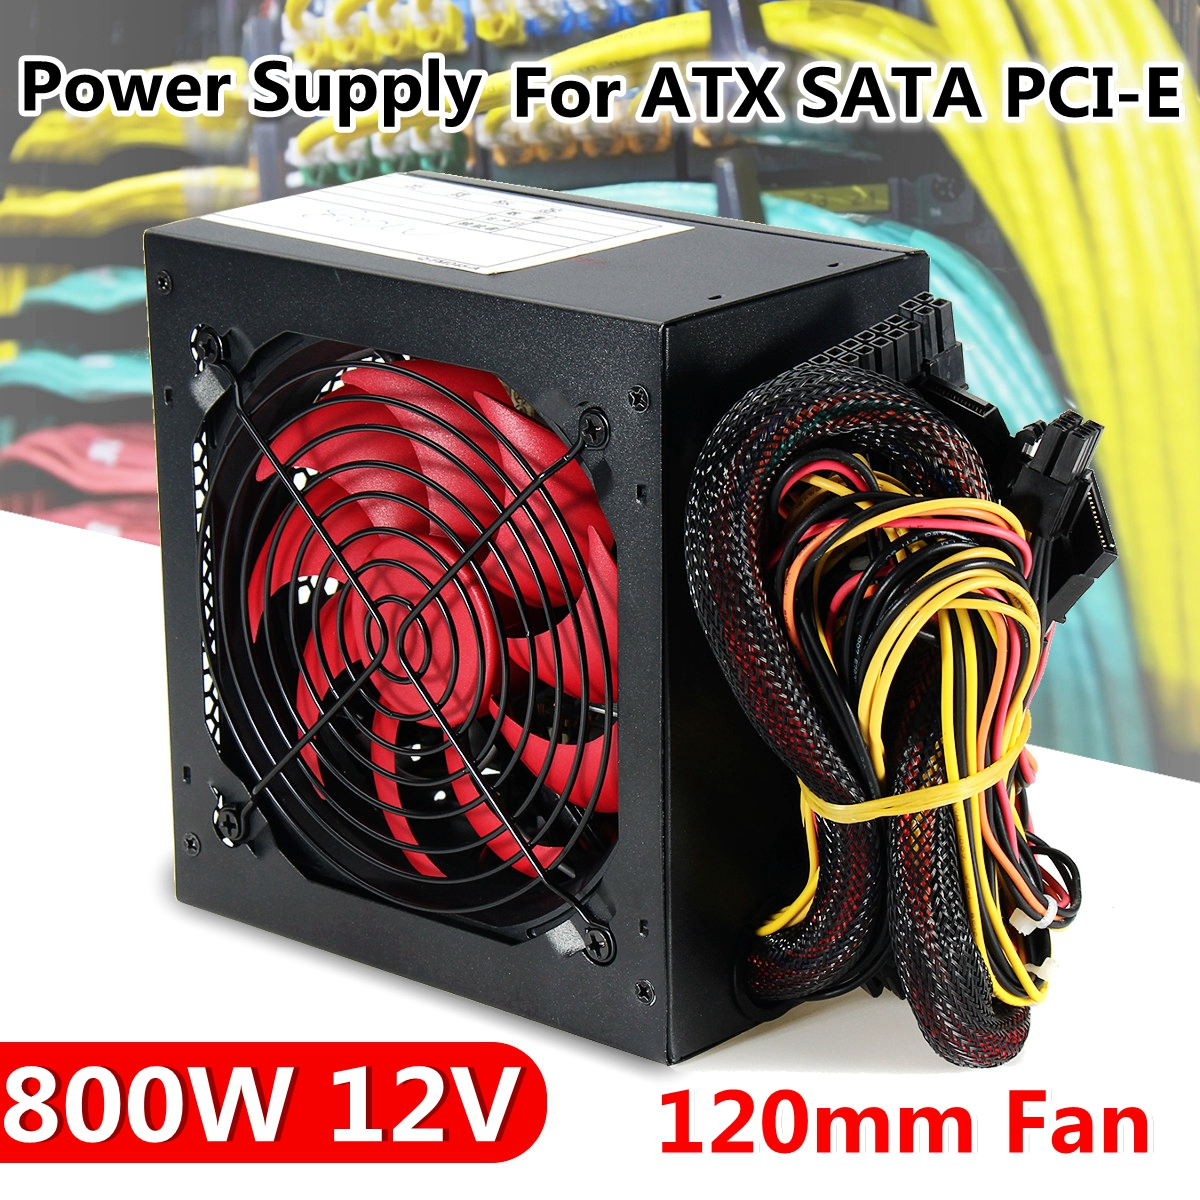 NEW Delta 800W Power Supply for Fujitsu RX300 RX200 S7 DPS-800NB B